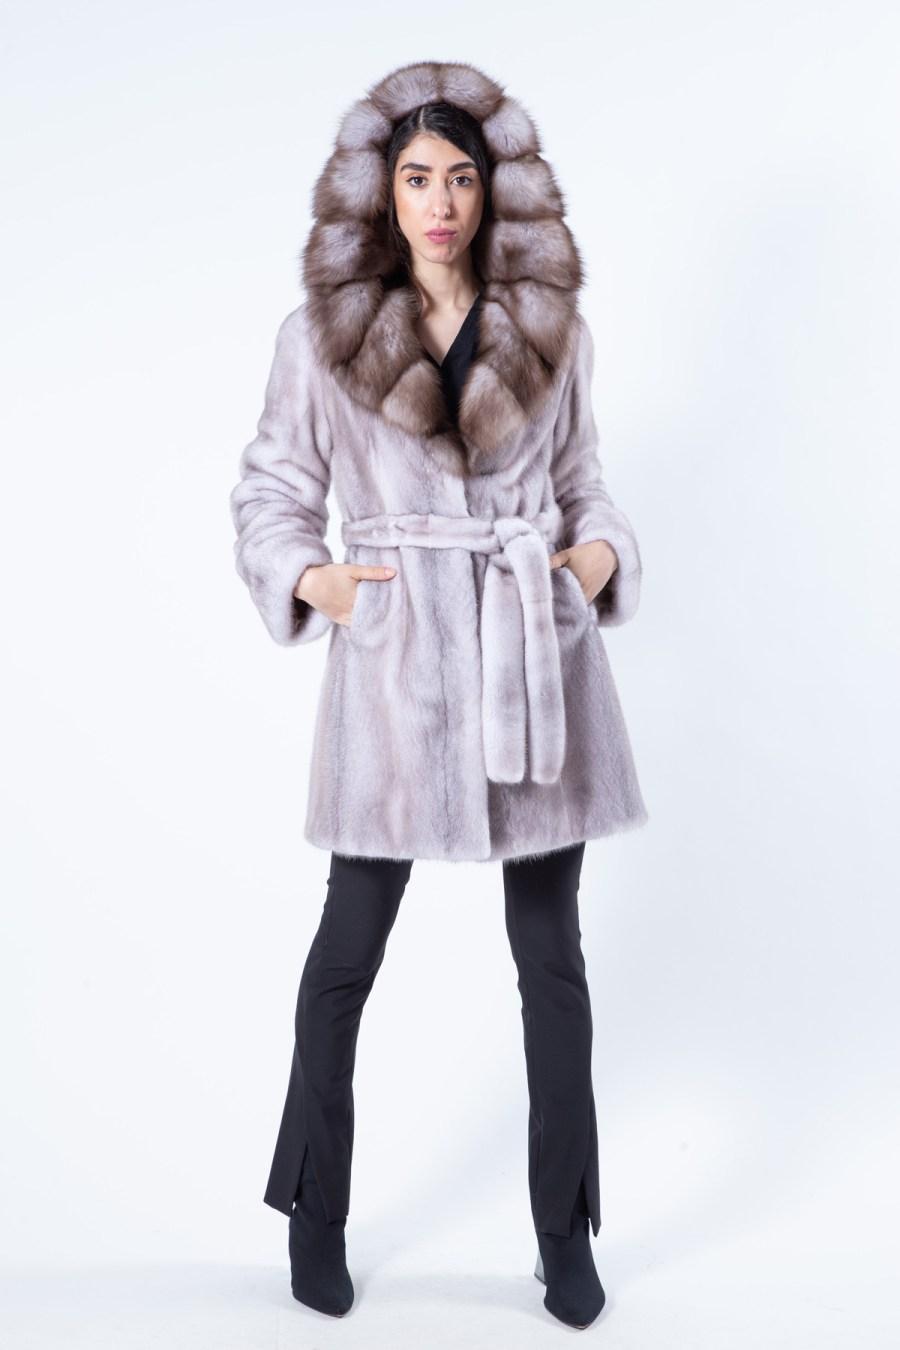 Aurora Ice Fume Mink Jacket with Marten Hood | Sarigianni Furs